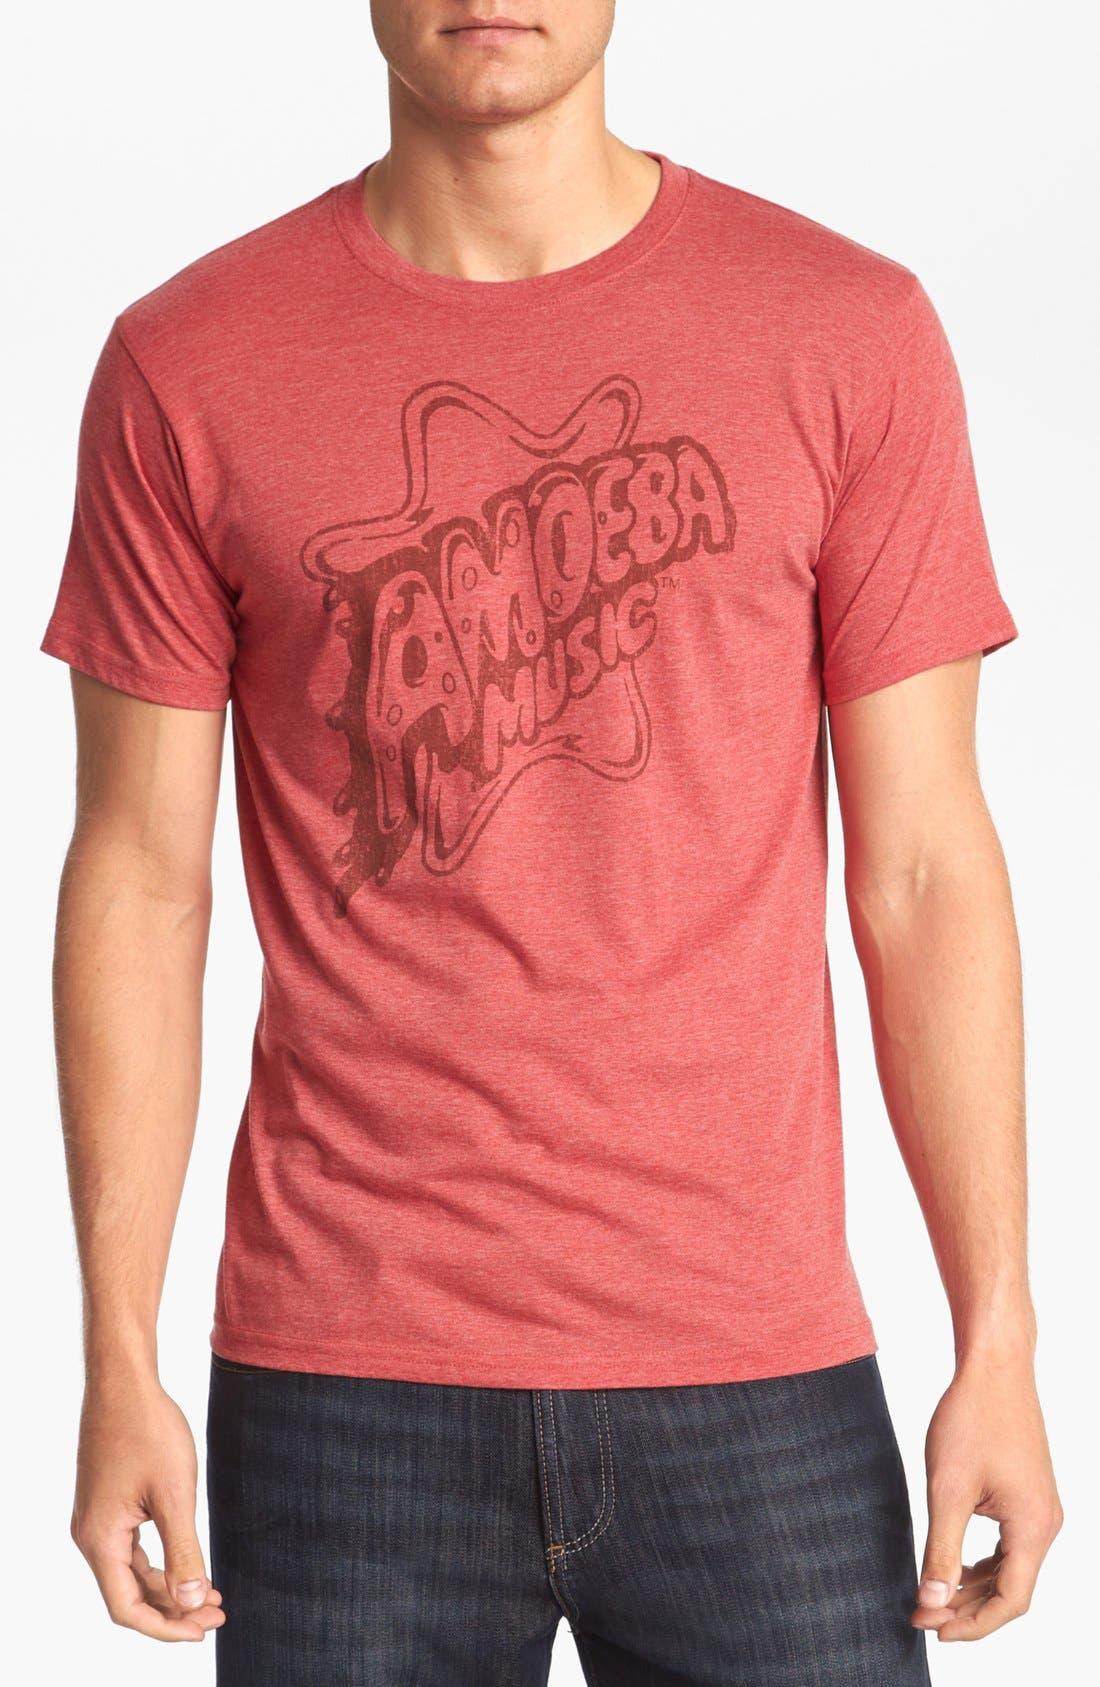 HORSES CUT SHOP 'Amoeba Music' T-Shirt, Main, color, 610